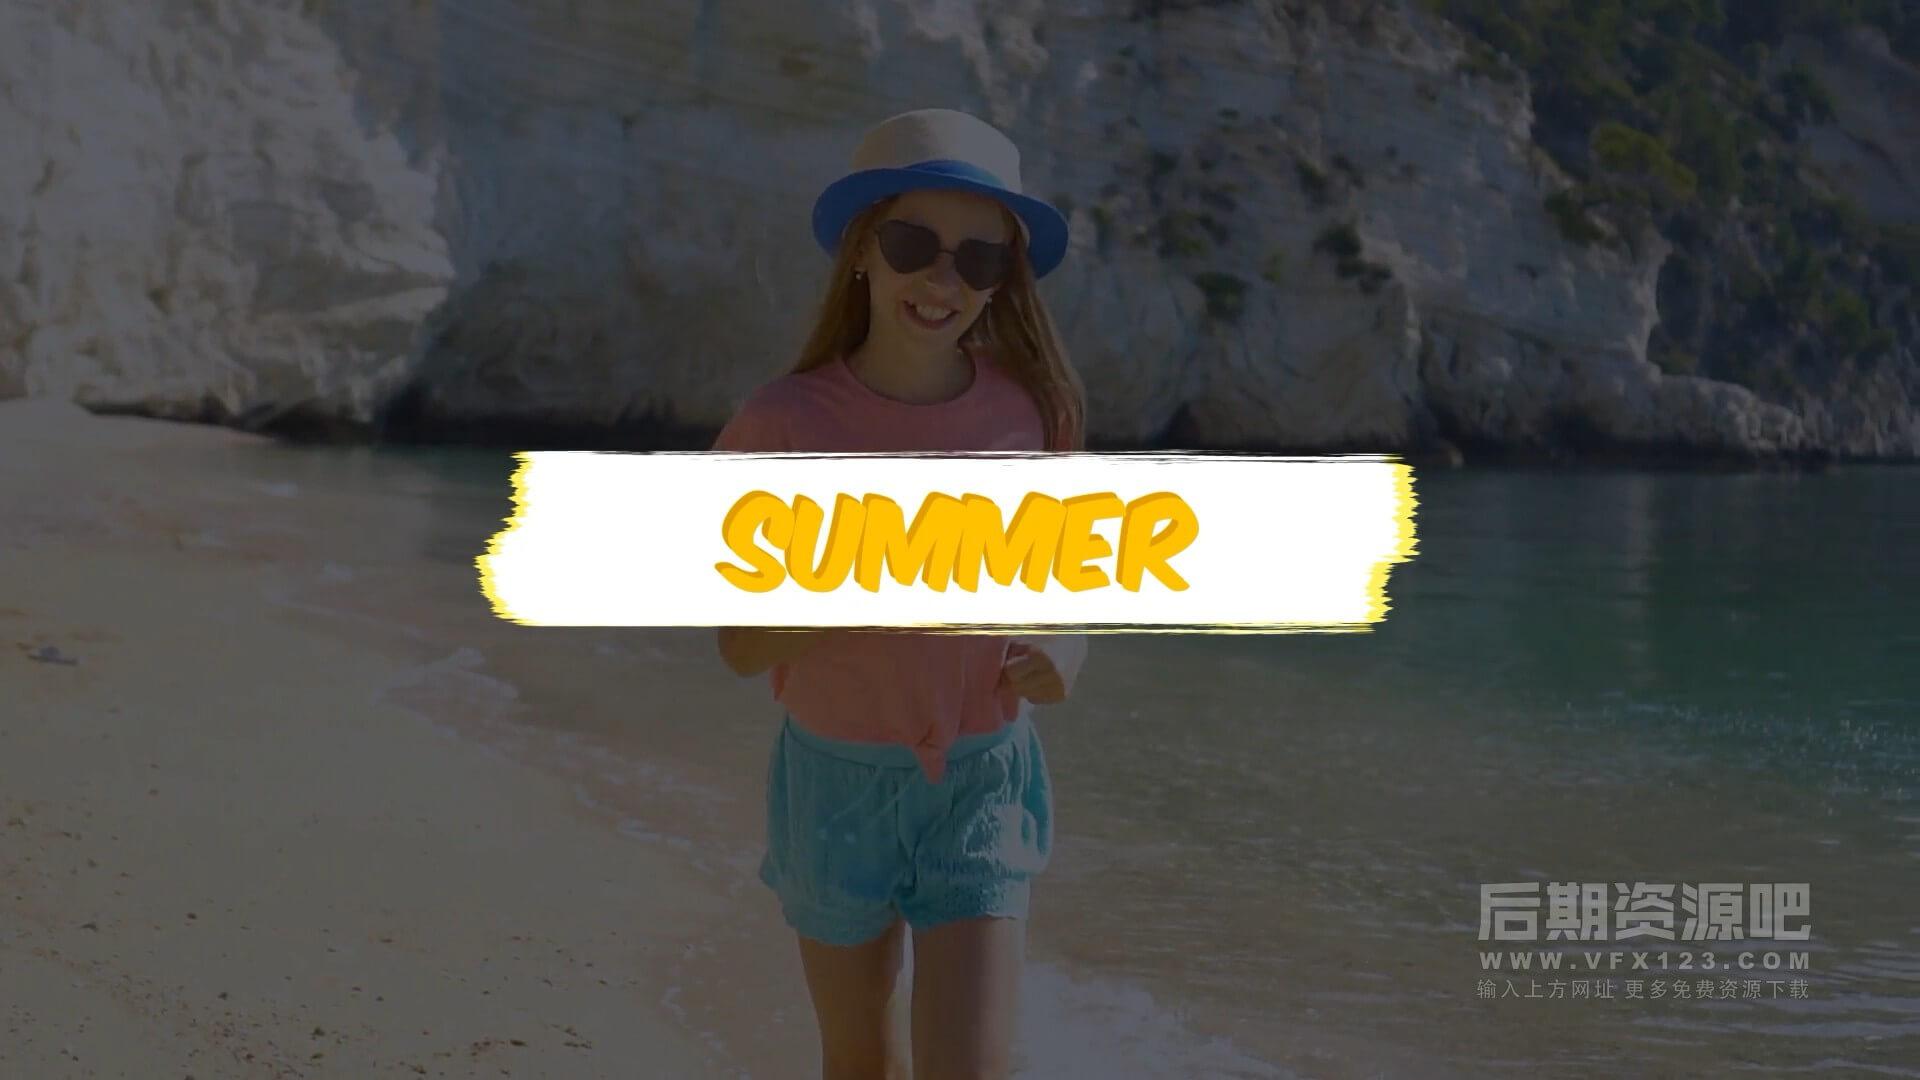 fcpx插件 卡通多彩夏季清爽标题模板 Colorful Summer Titles